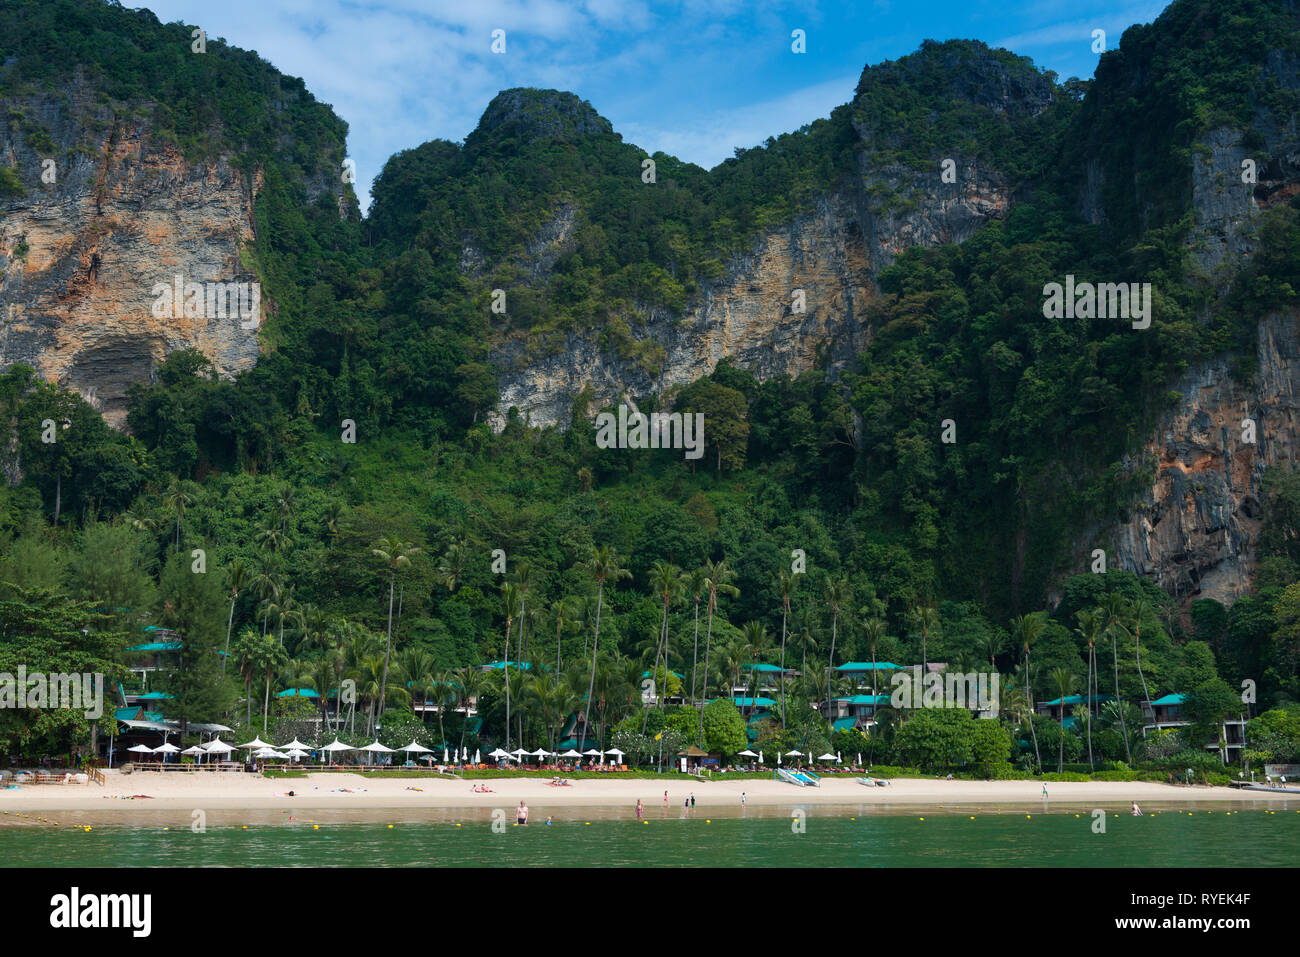 Panorama of Centara Grand Resort, limestone cliffs and beach near Ao Nang, Krabi province, Thailand - Stock Image